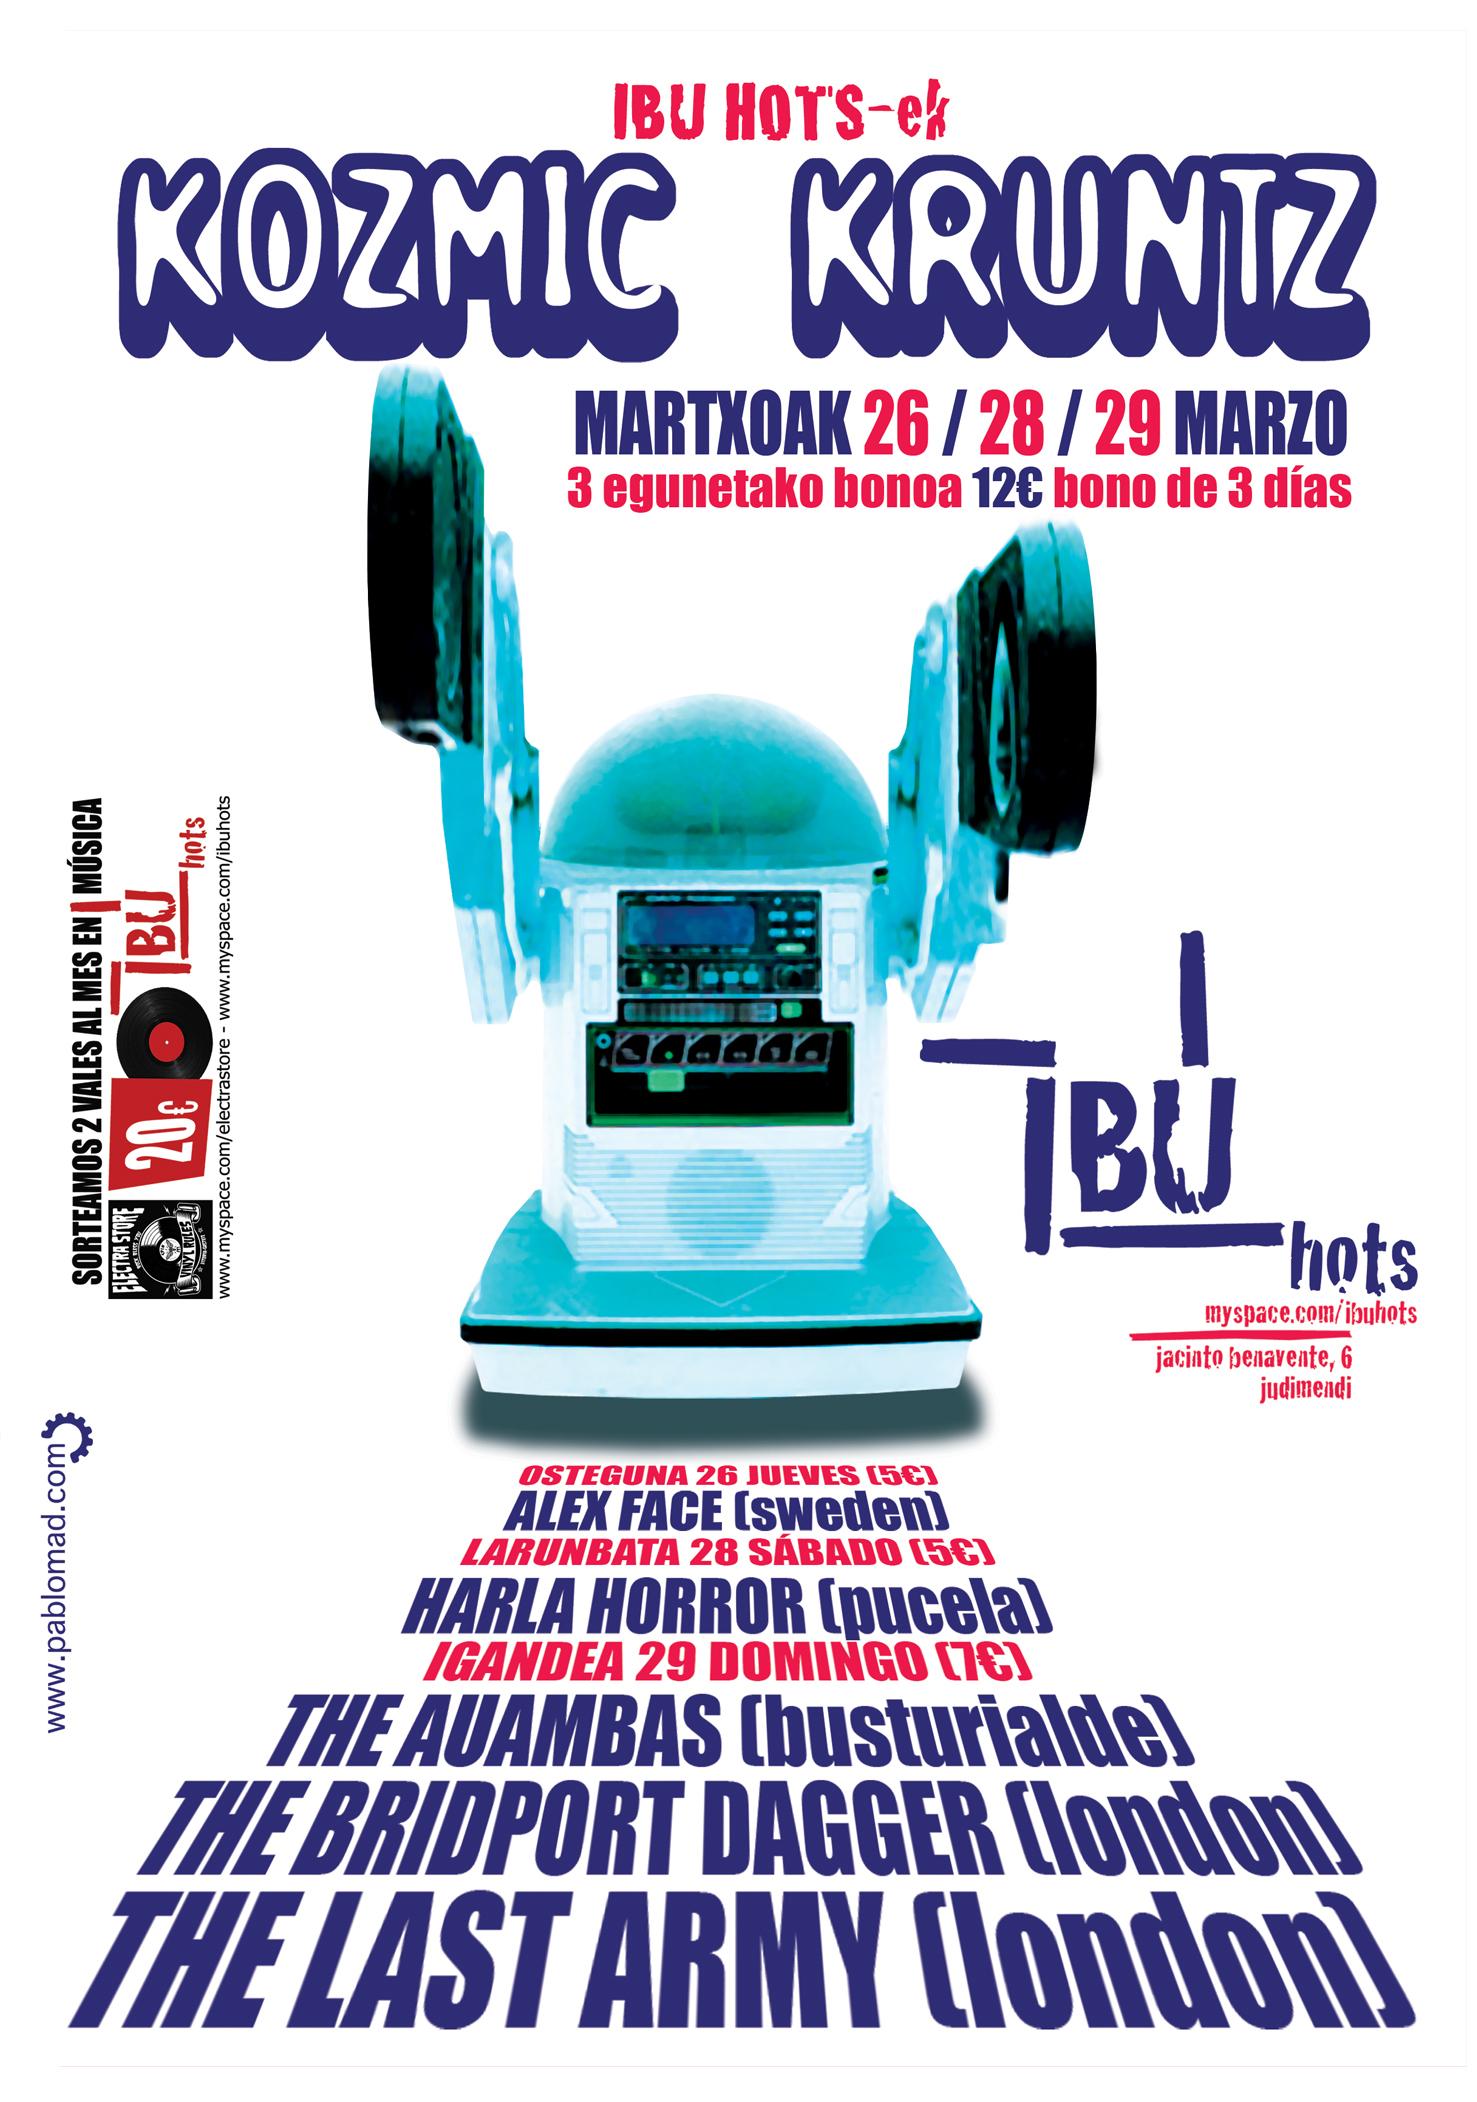 flyer marzo 09 ibu pablomad